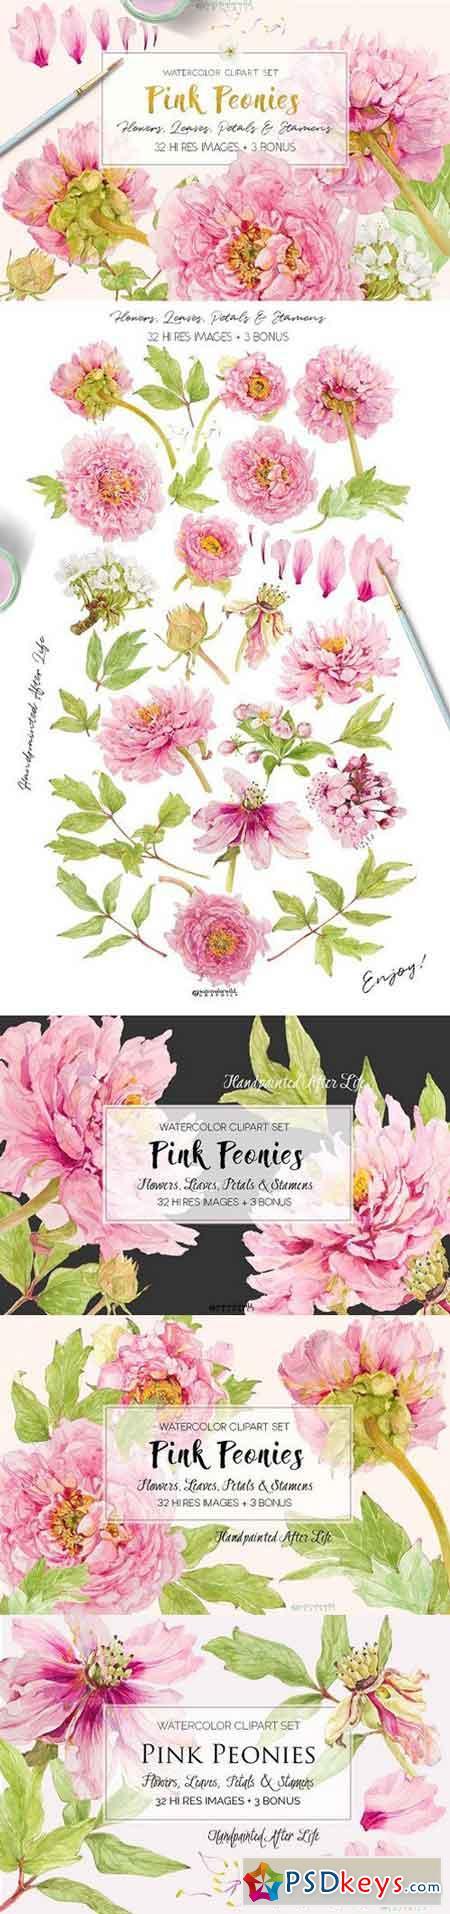 Pink Peonies-Clipart Set 1518921